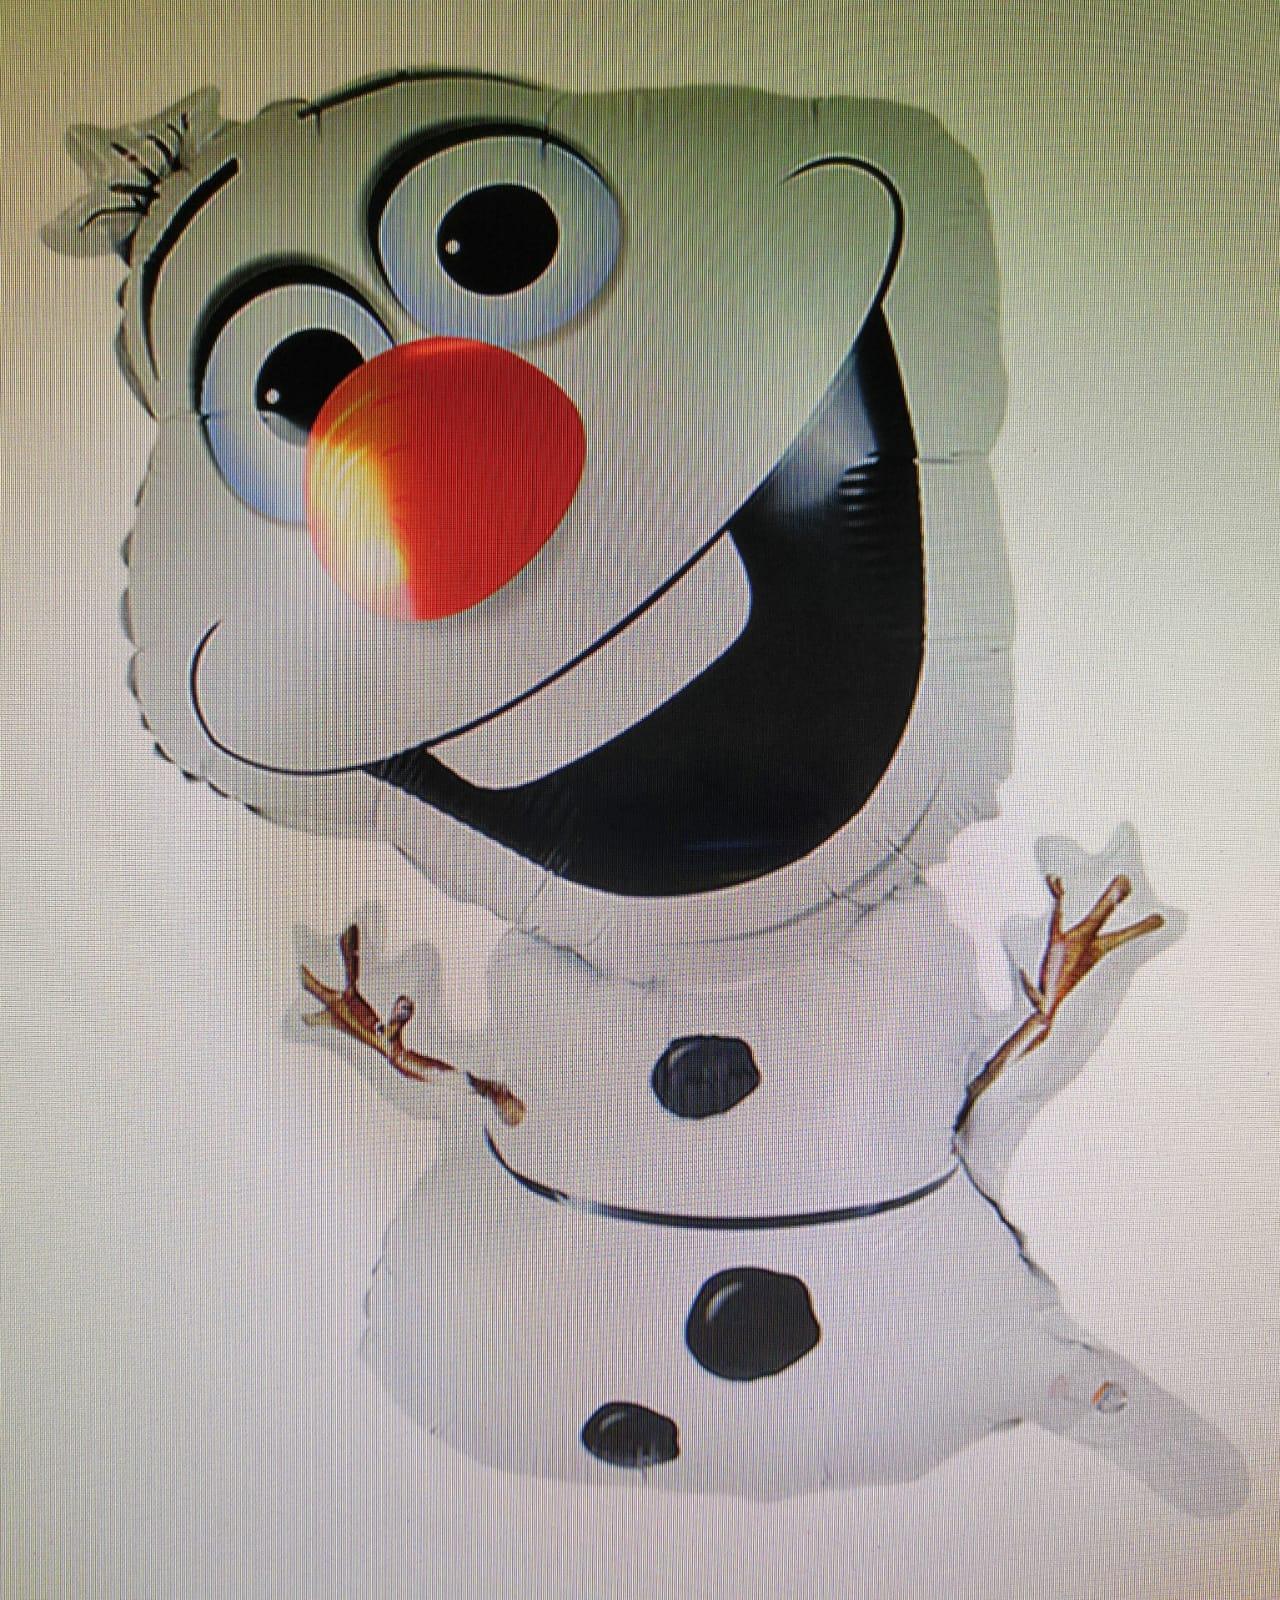 olaf der schneemann 70 cm  dj falo ballon shop